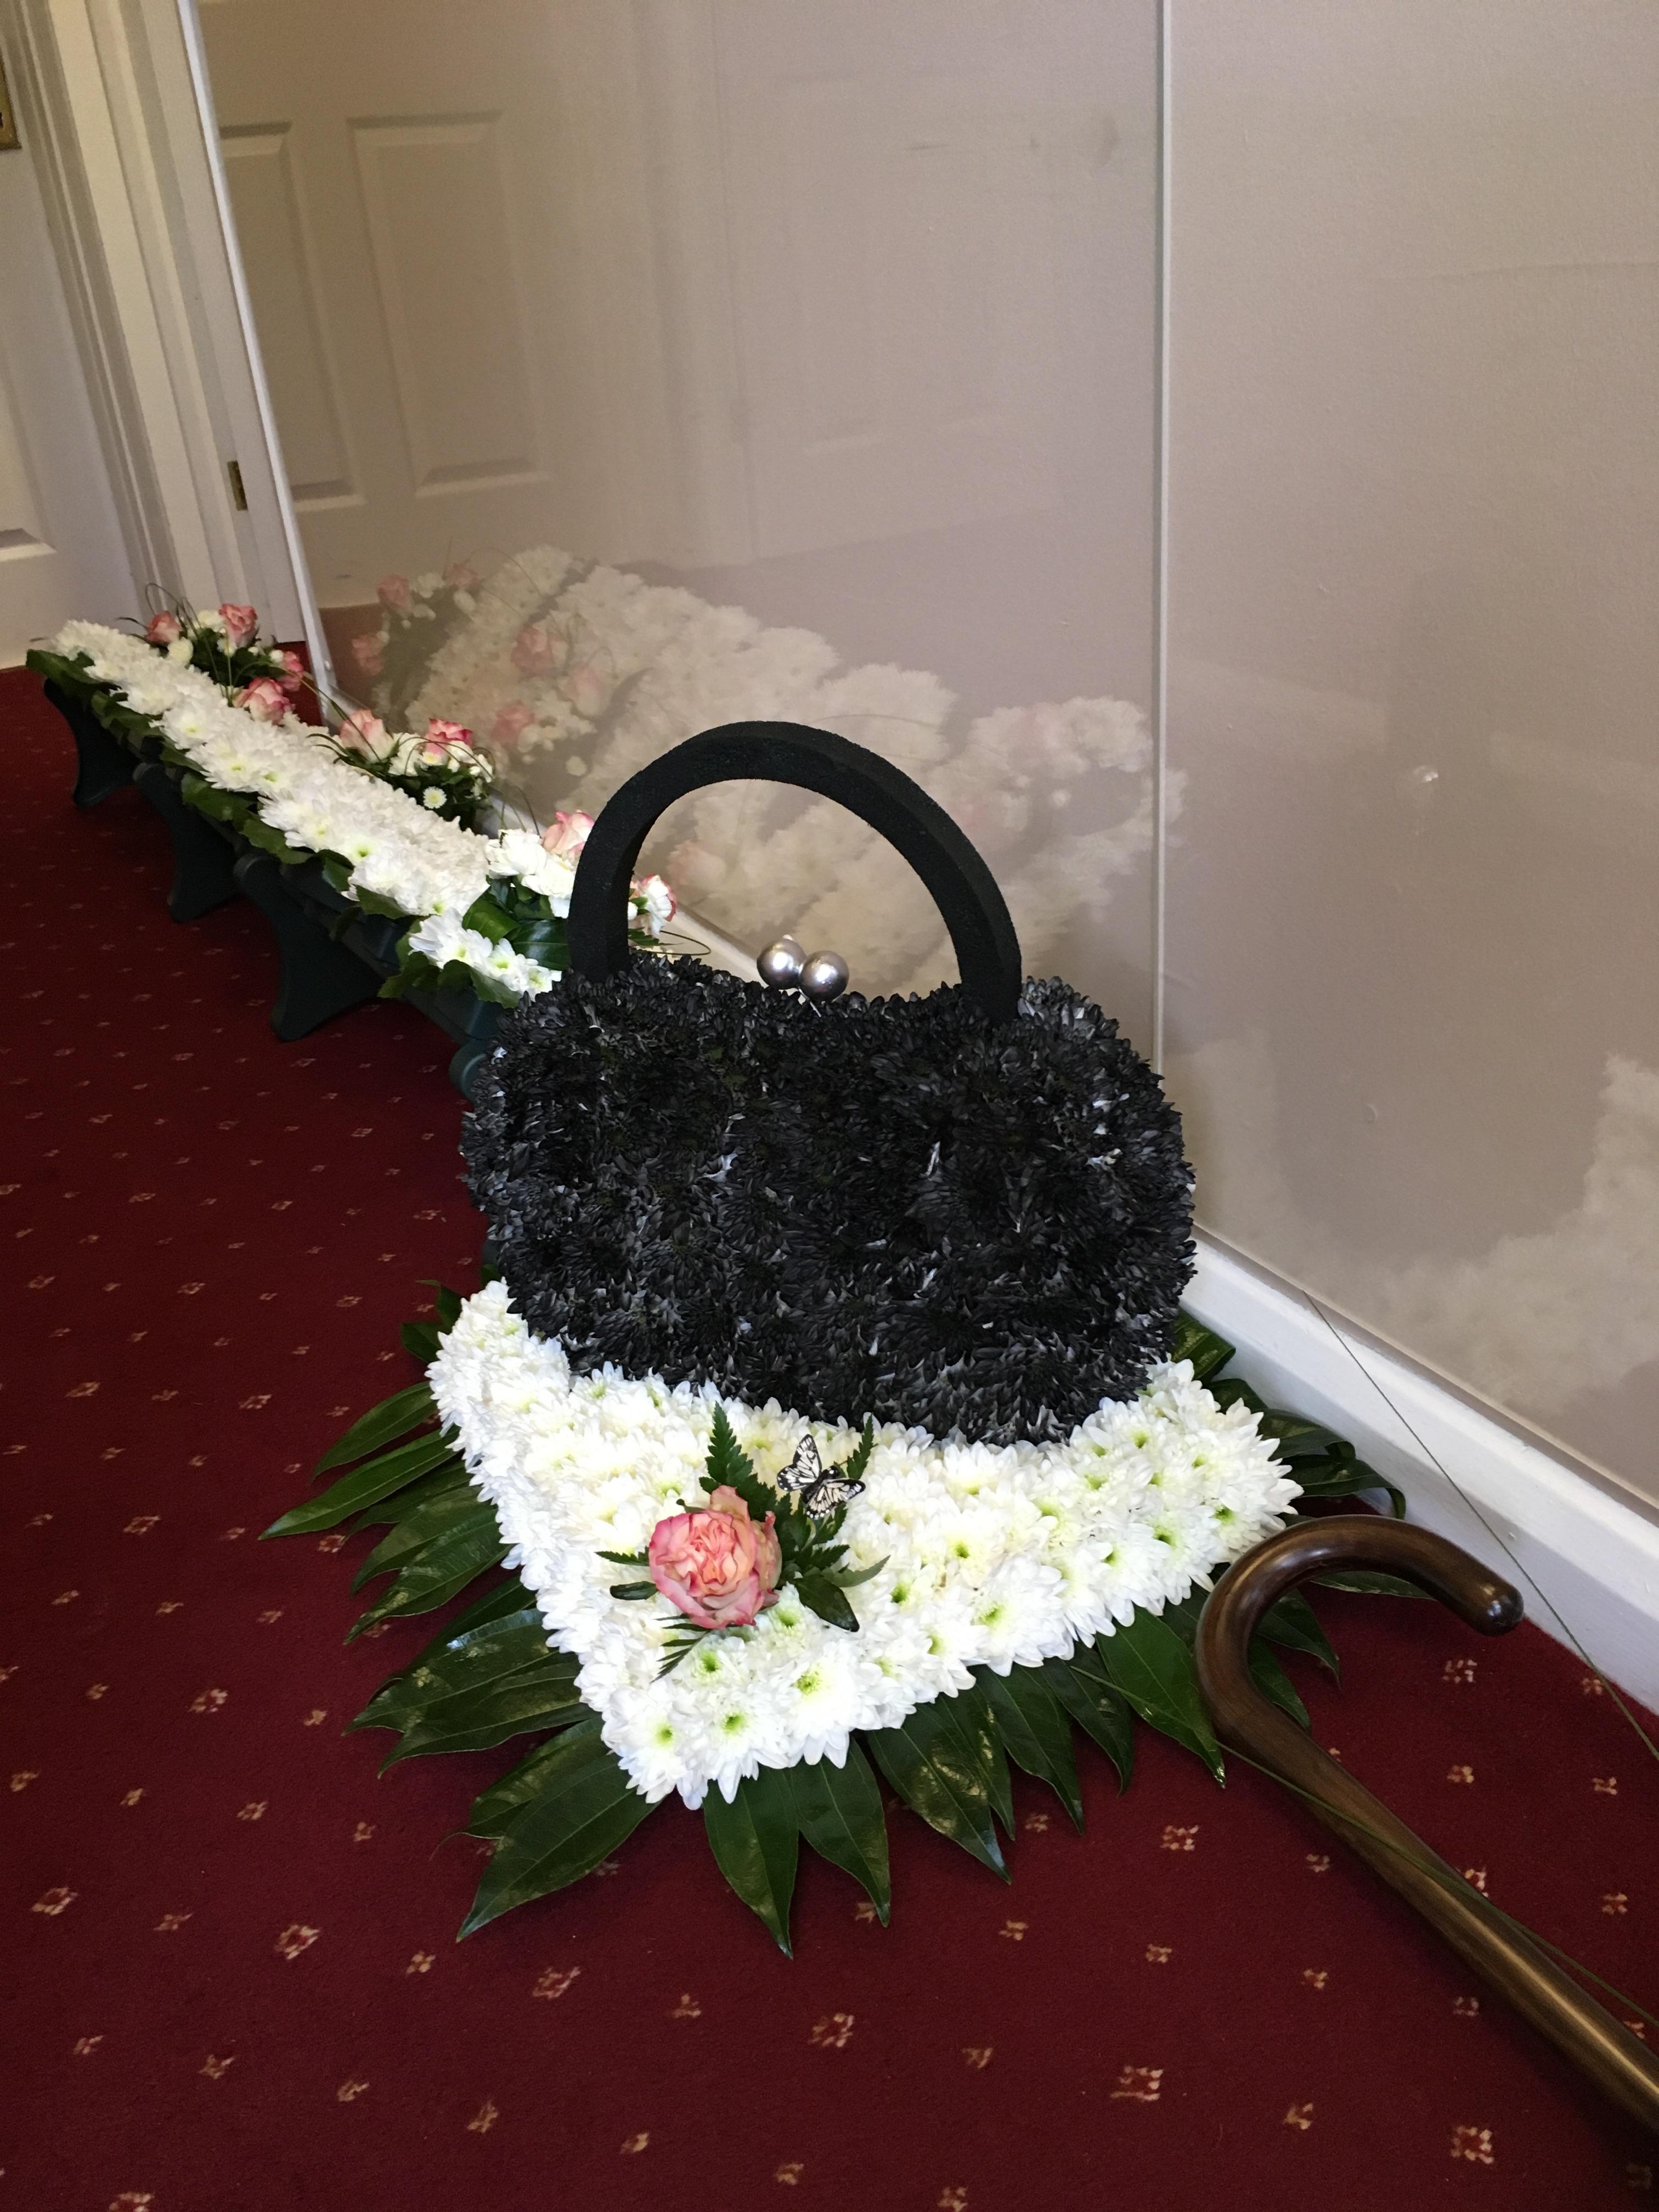 Handbag made from flowers